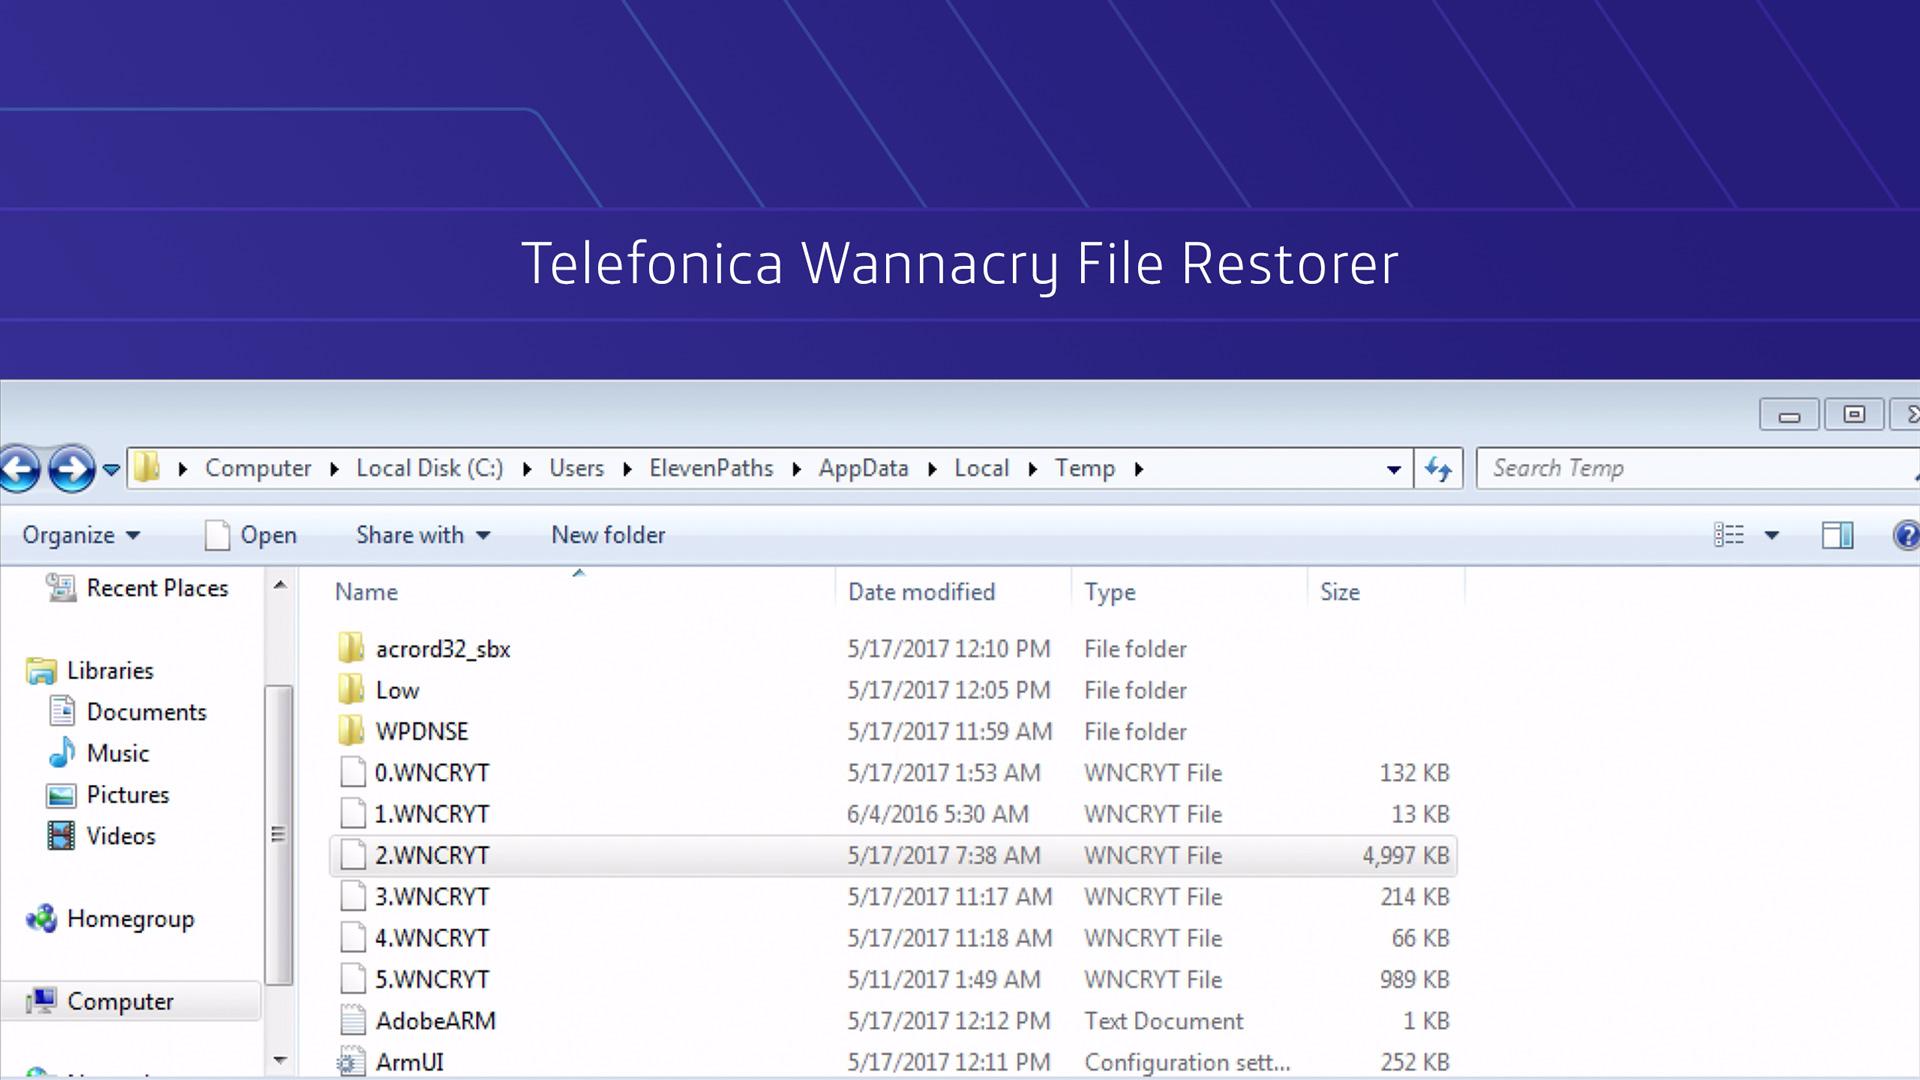 Vídeo Wannacry File Restorer